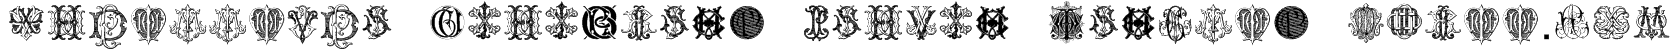 Intellecta Monograms Random Samples Three.vfb Font